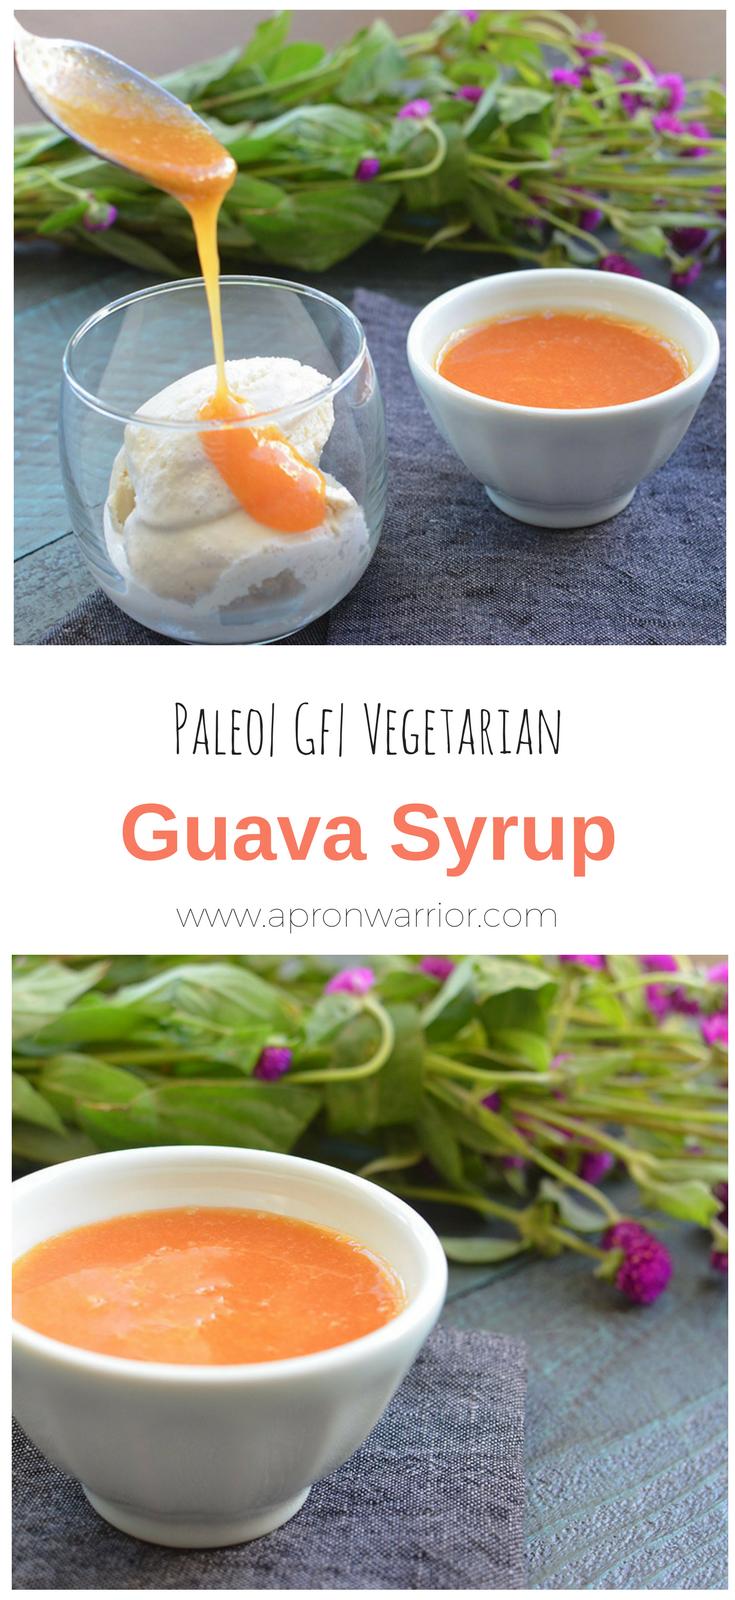 Guava Syrup - Apron Warrior